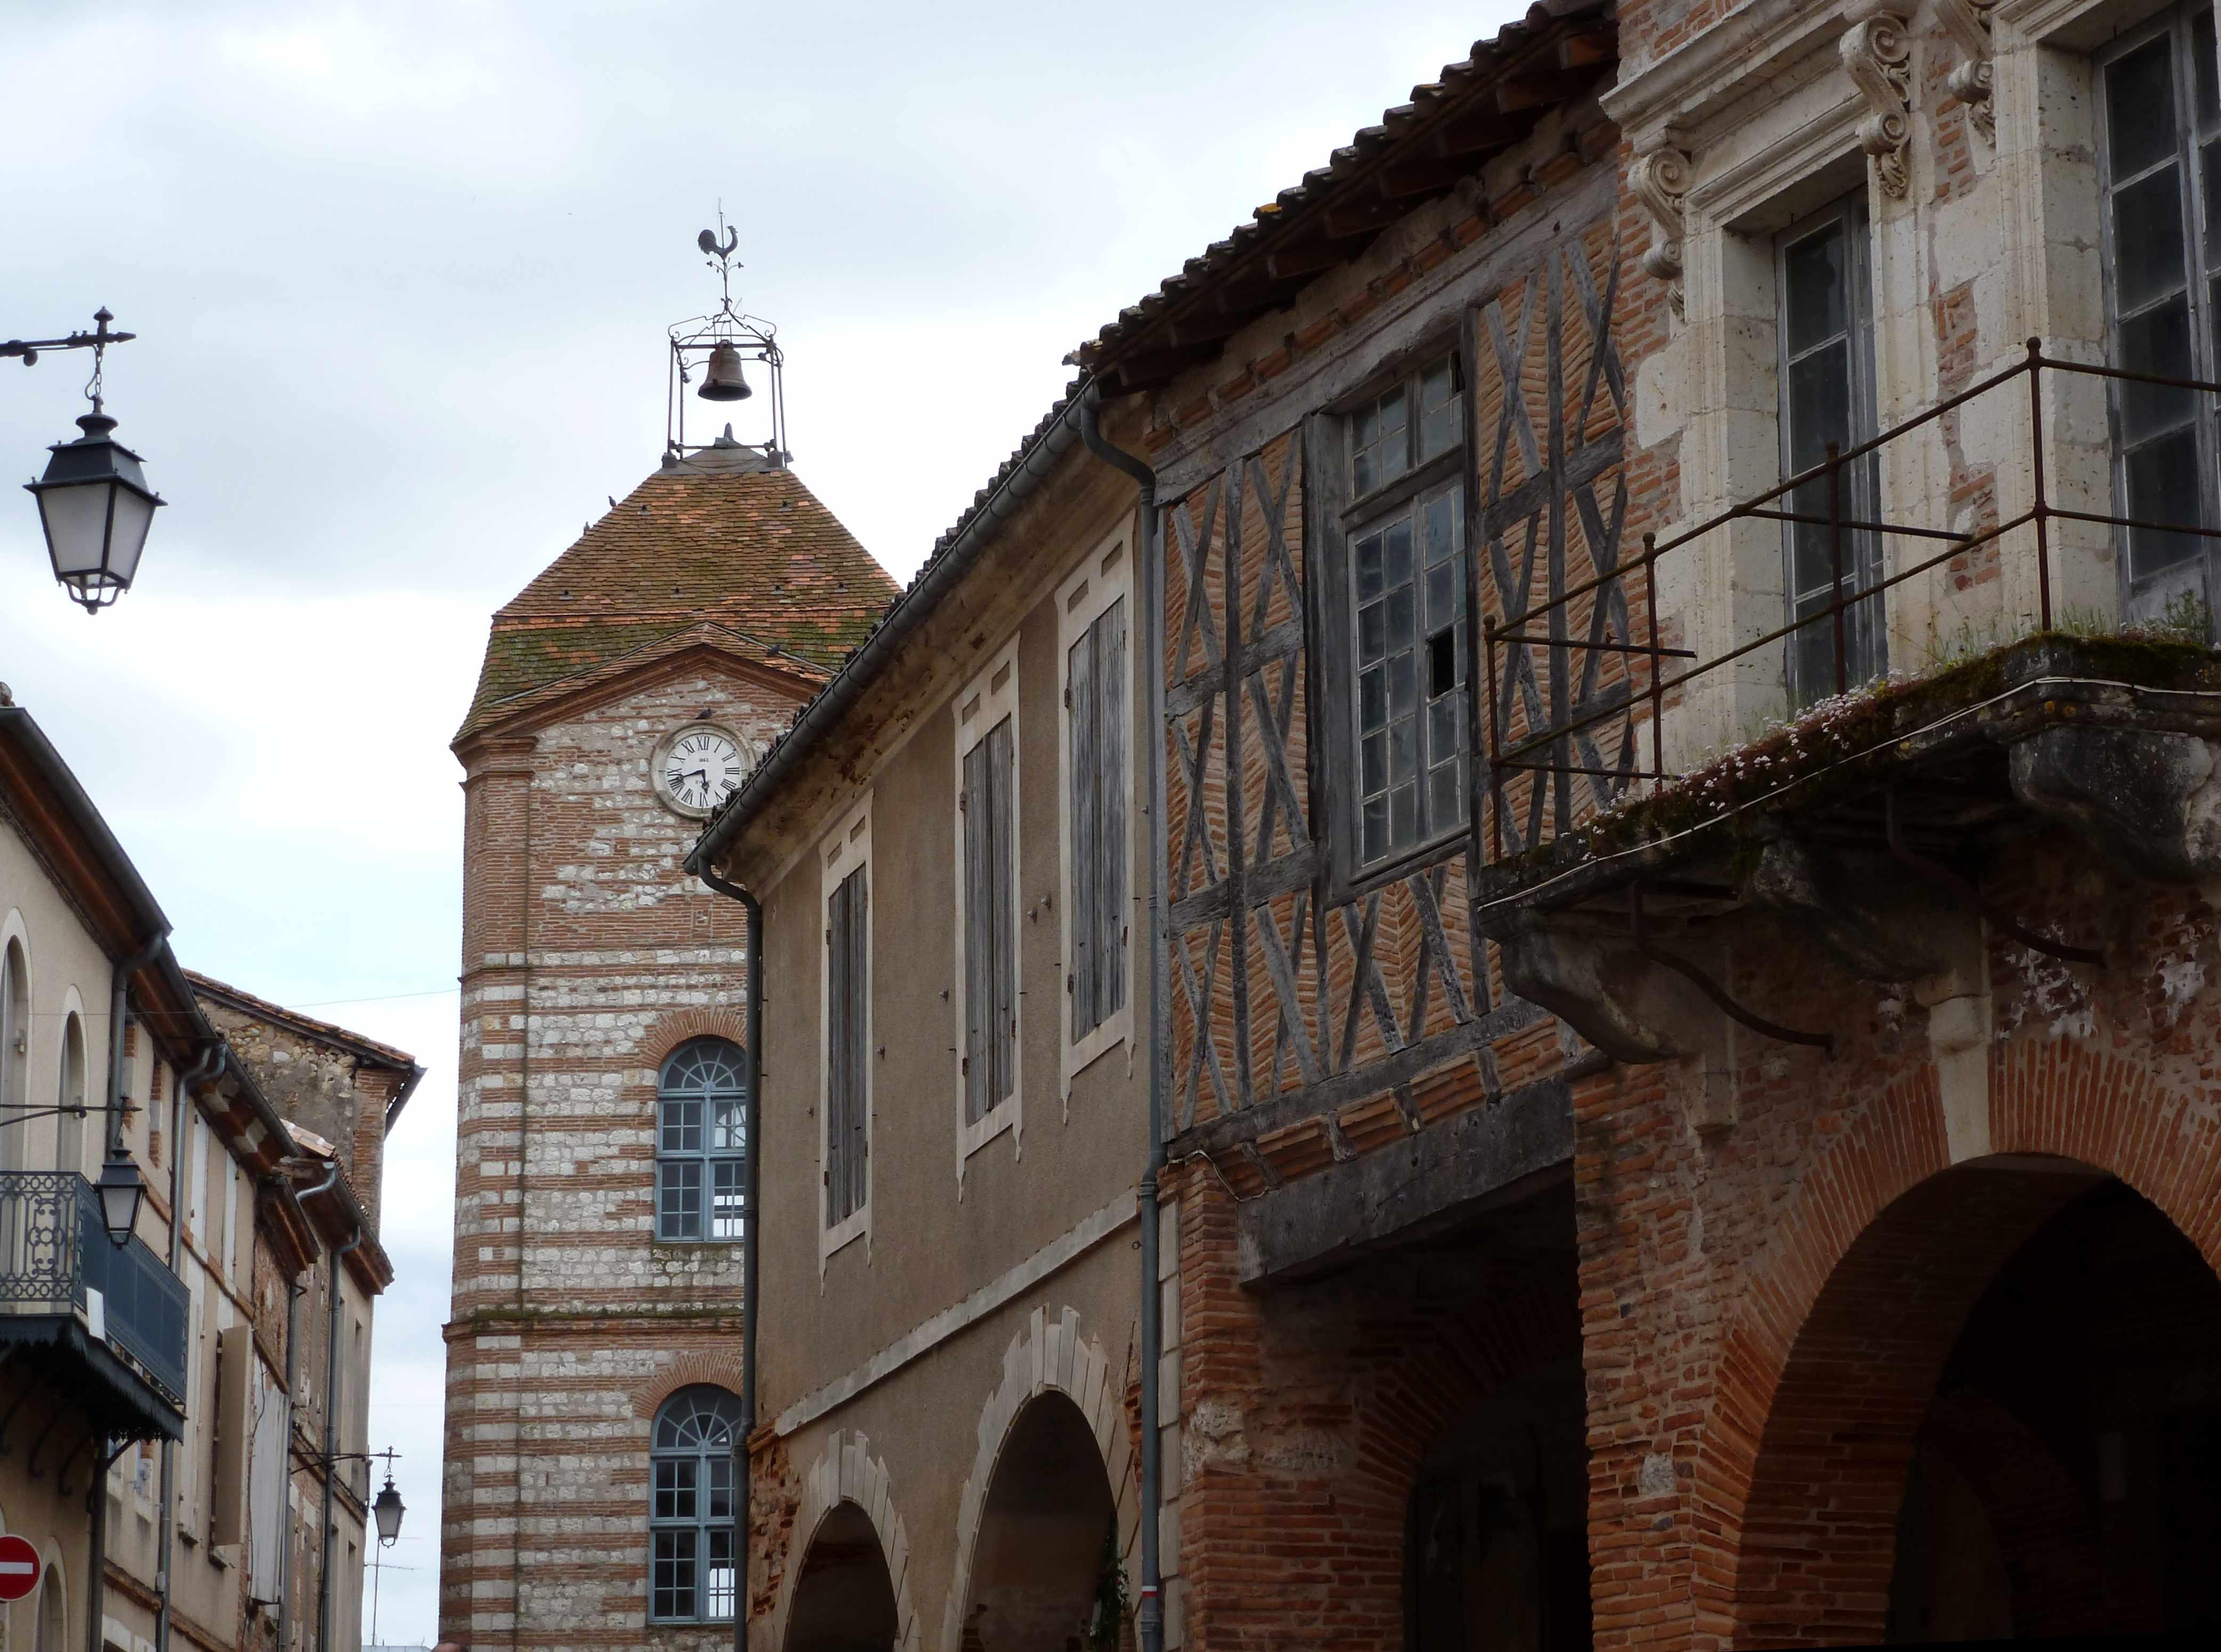 Auvillar-tour-de-l-horloge-2014-05